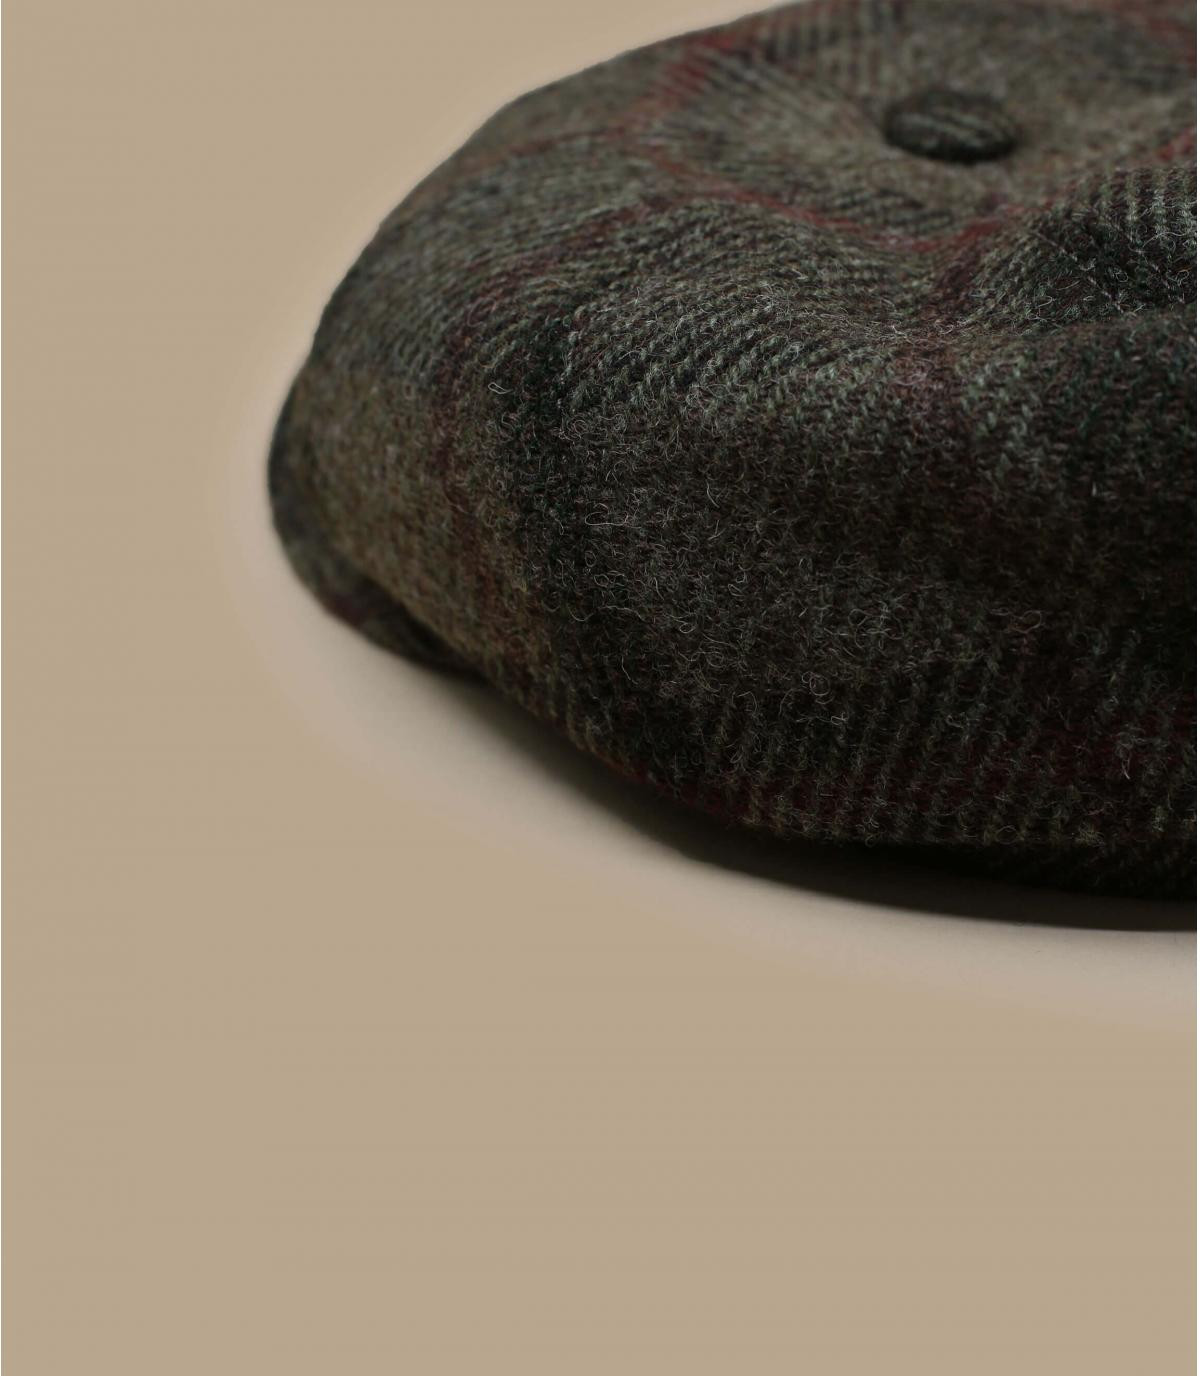 Details Hatteras Virgin Wool check beige olive - afbeeling 2